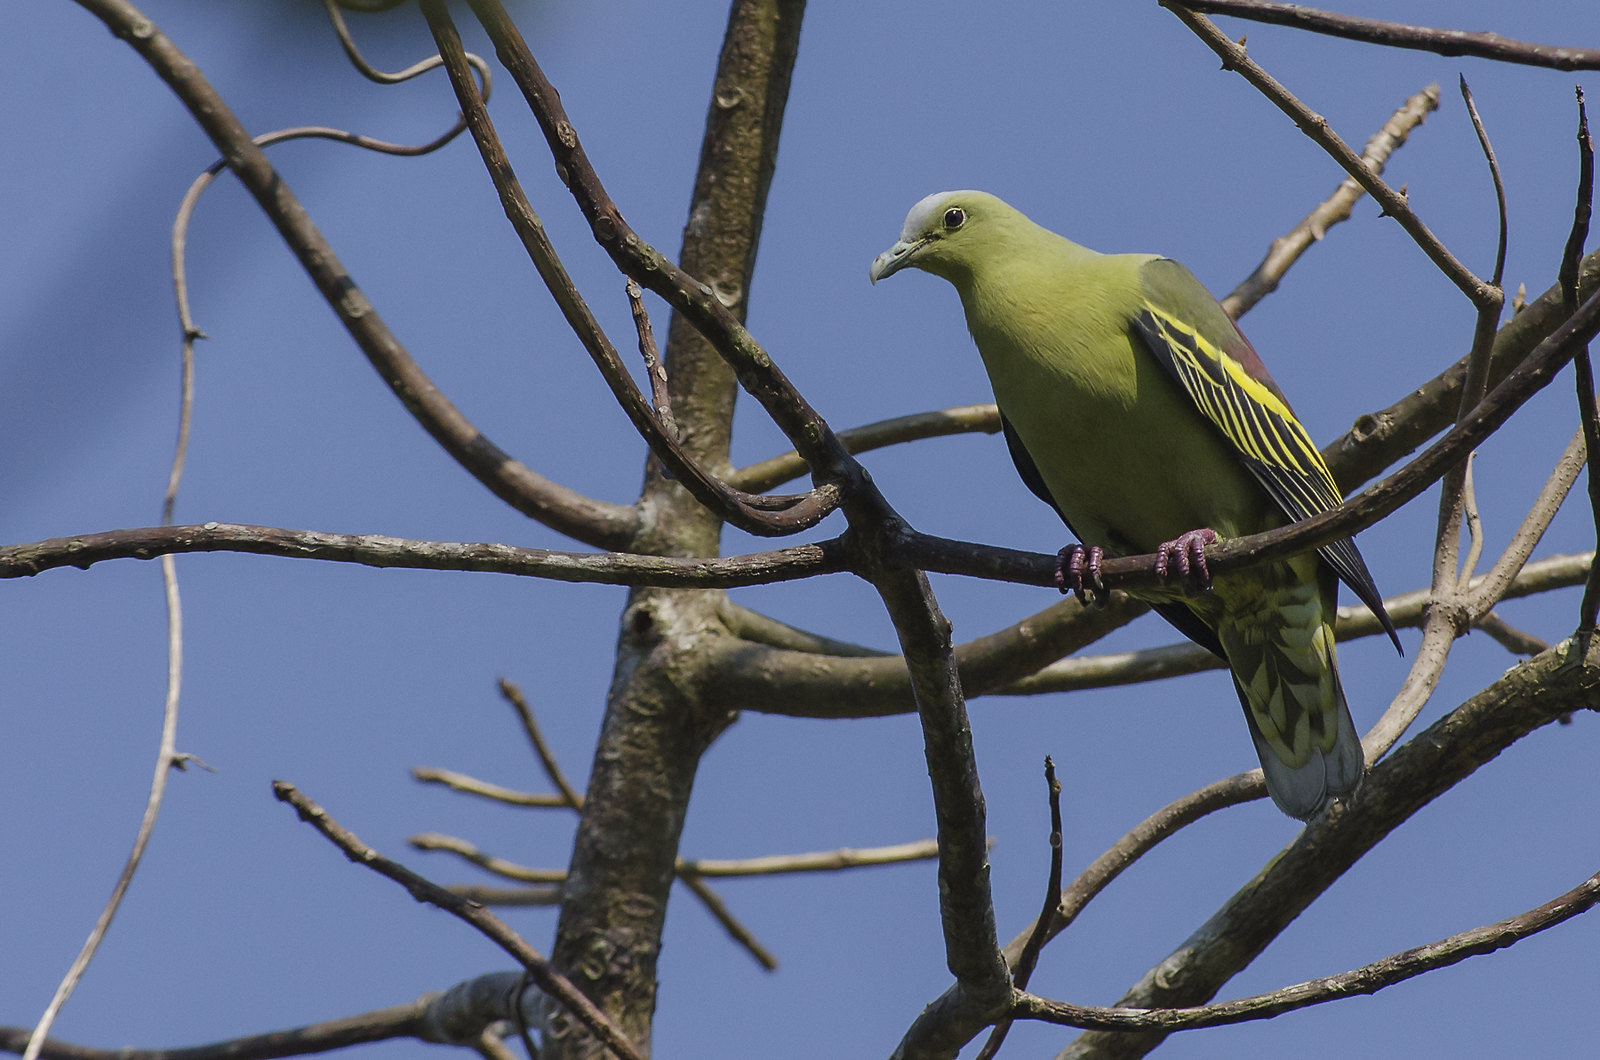 Andaman Green Pigeon (Treron chloropterus) | Location: South ... Endemic Species Nicobar Pigeon